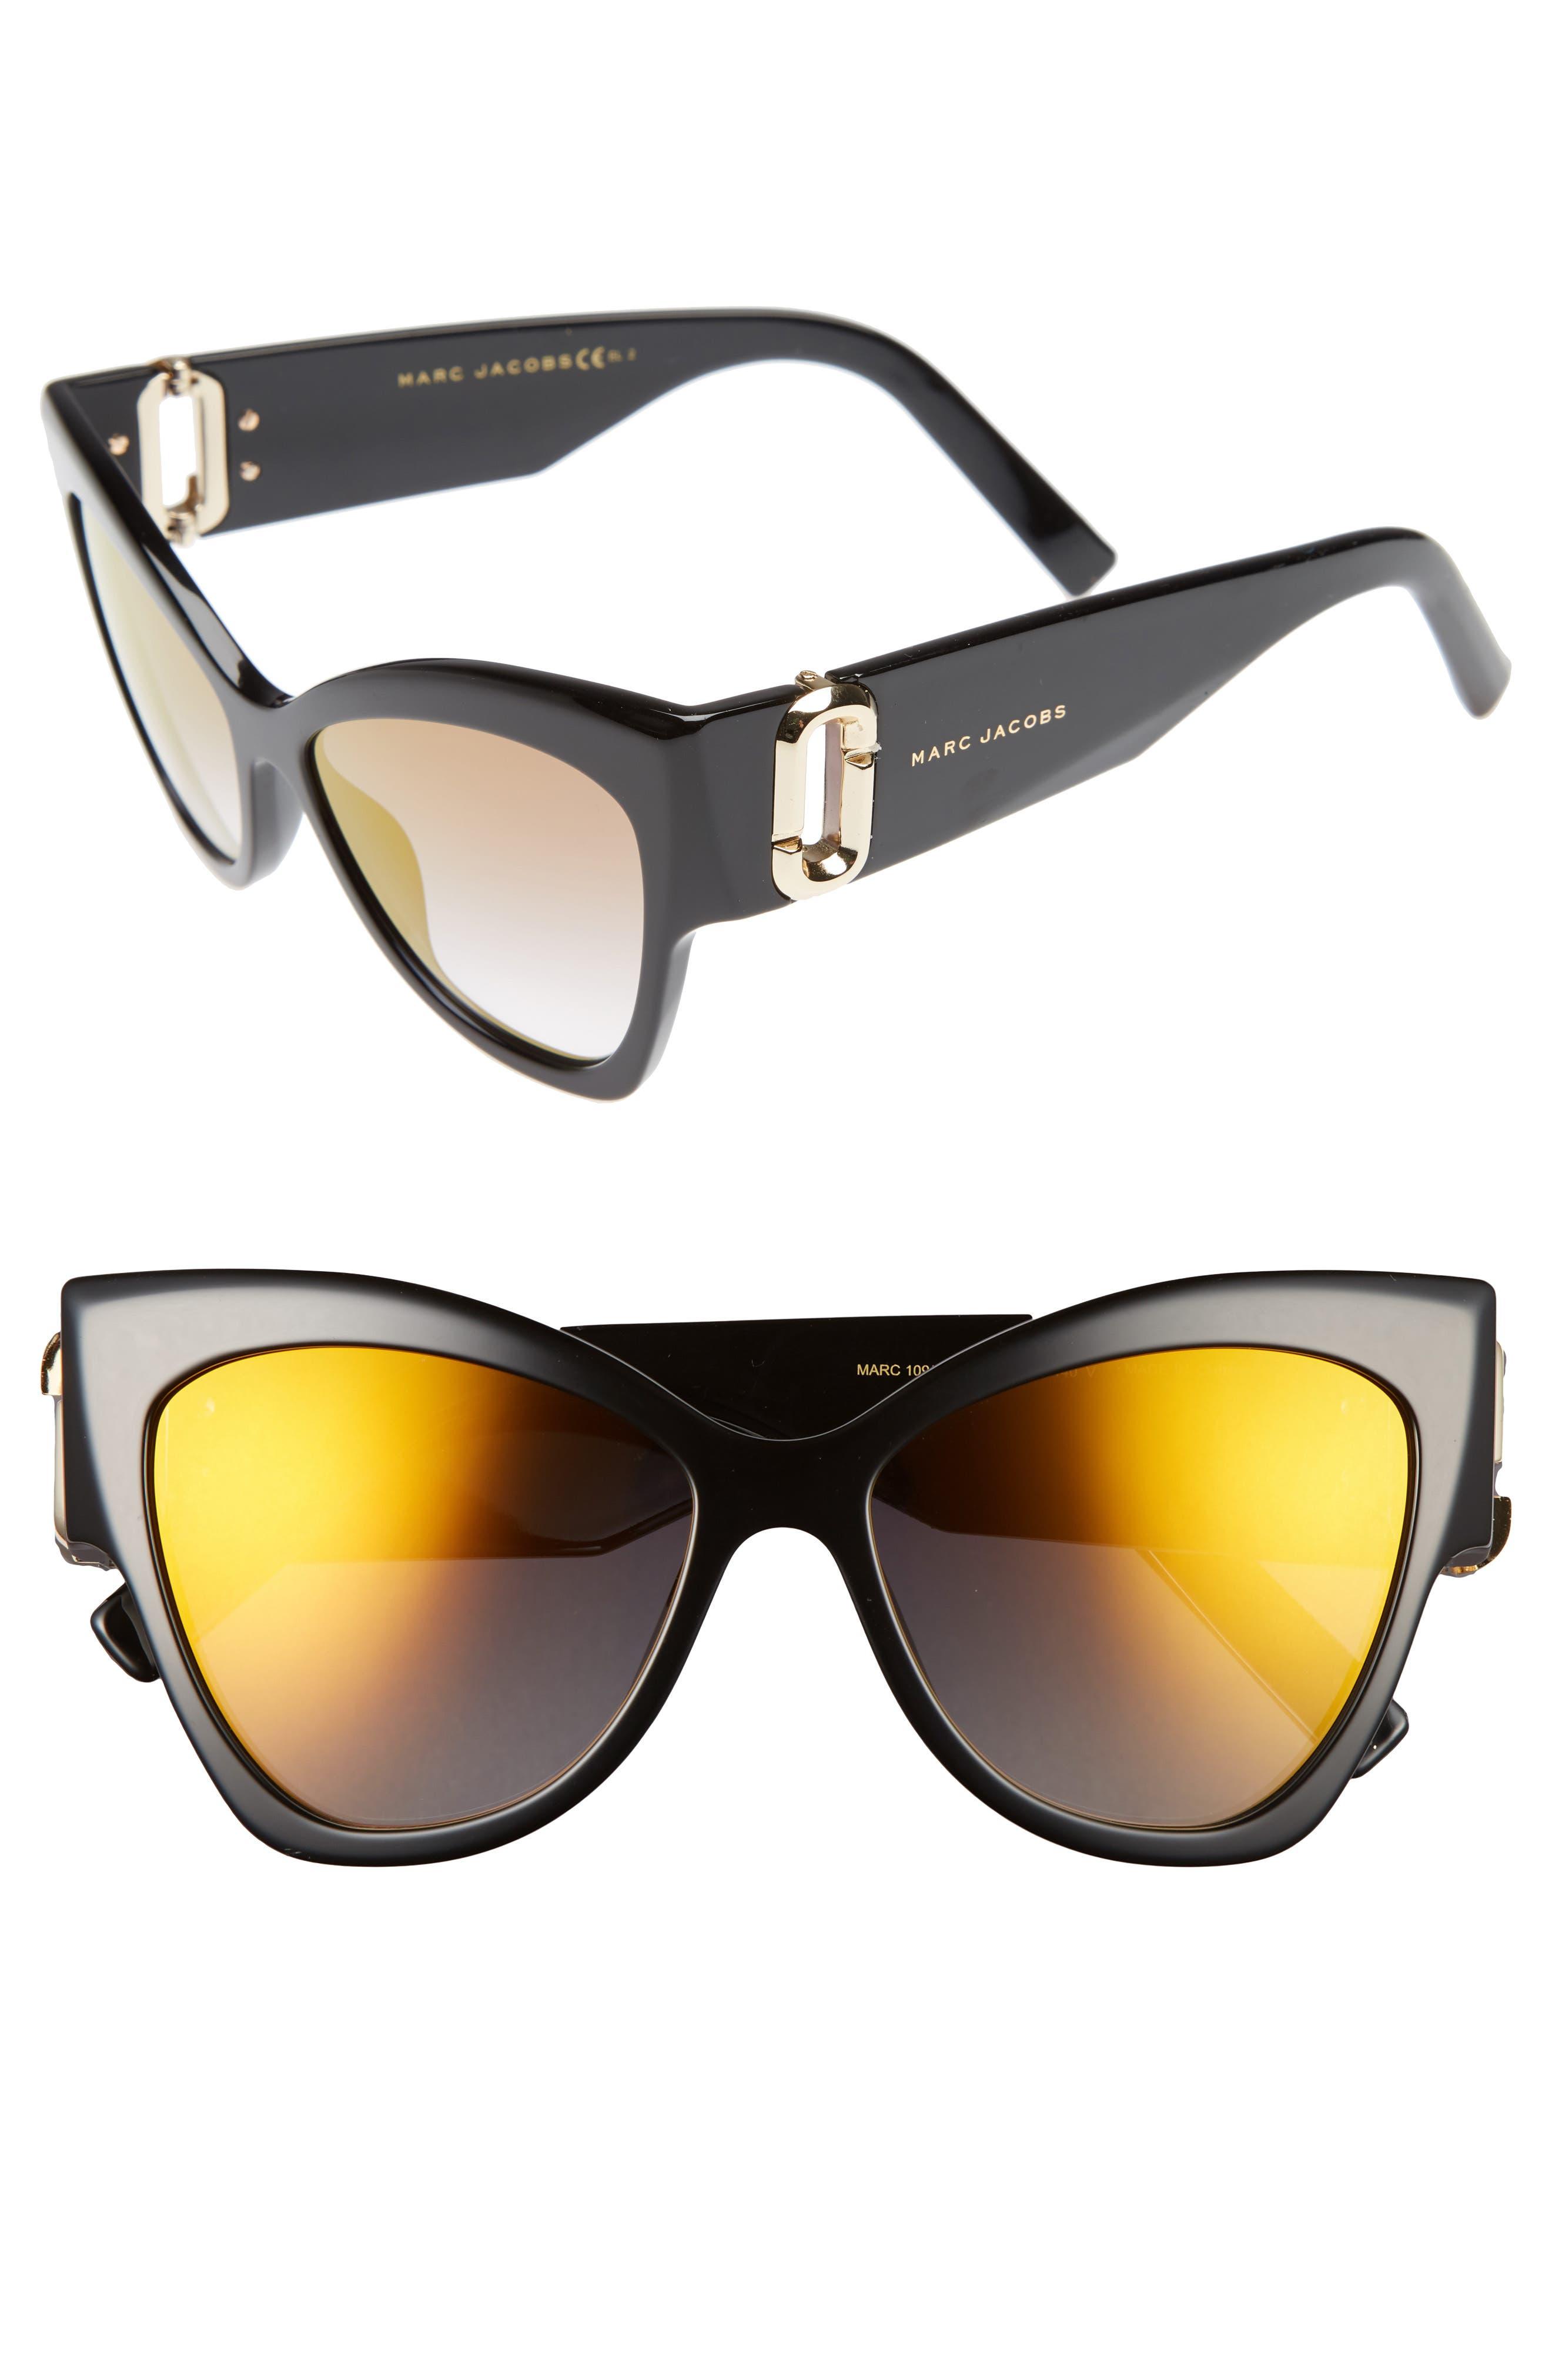 Main Image - MARC JACOBS 54mm Oversized Sunglasses